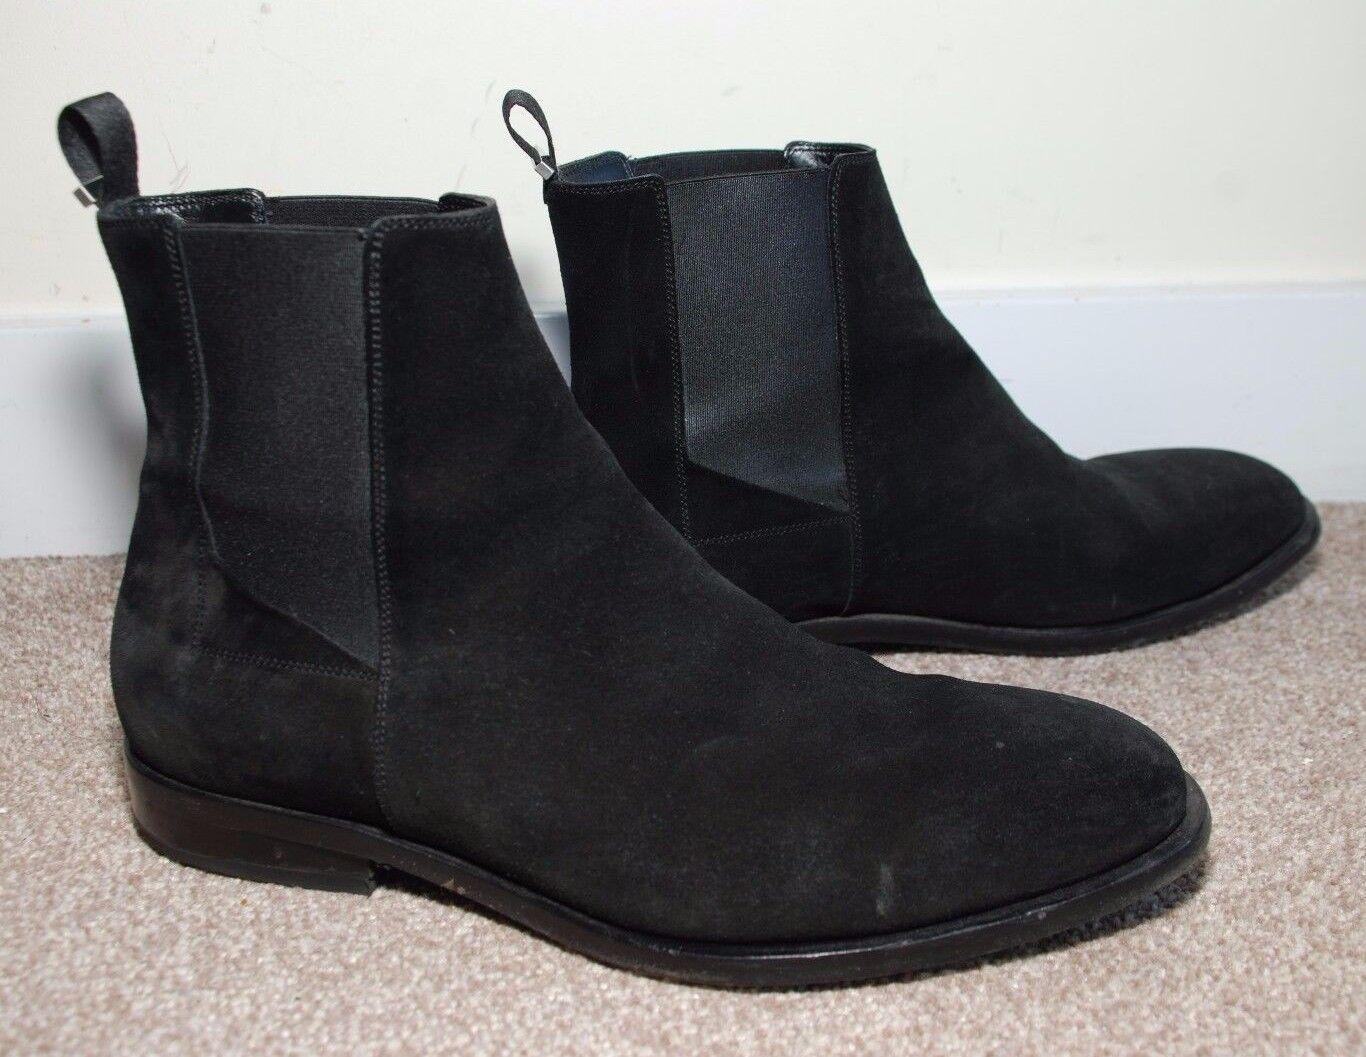 Balenciaga Men's Black Suede Chelsea Boots size 42